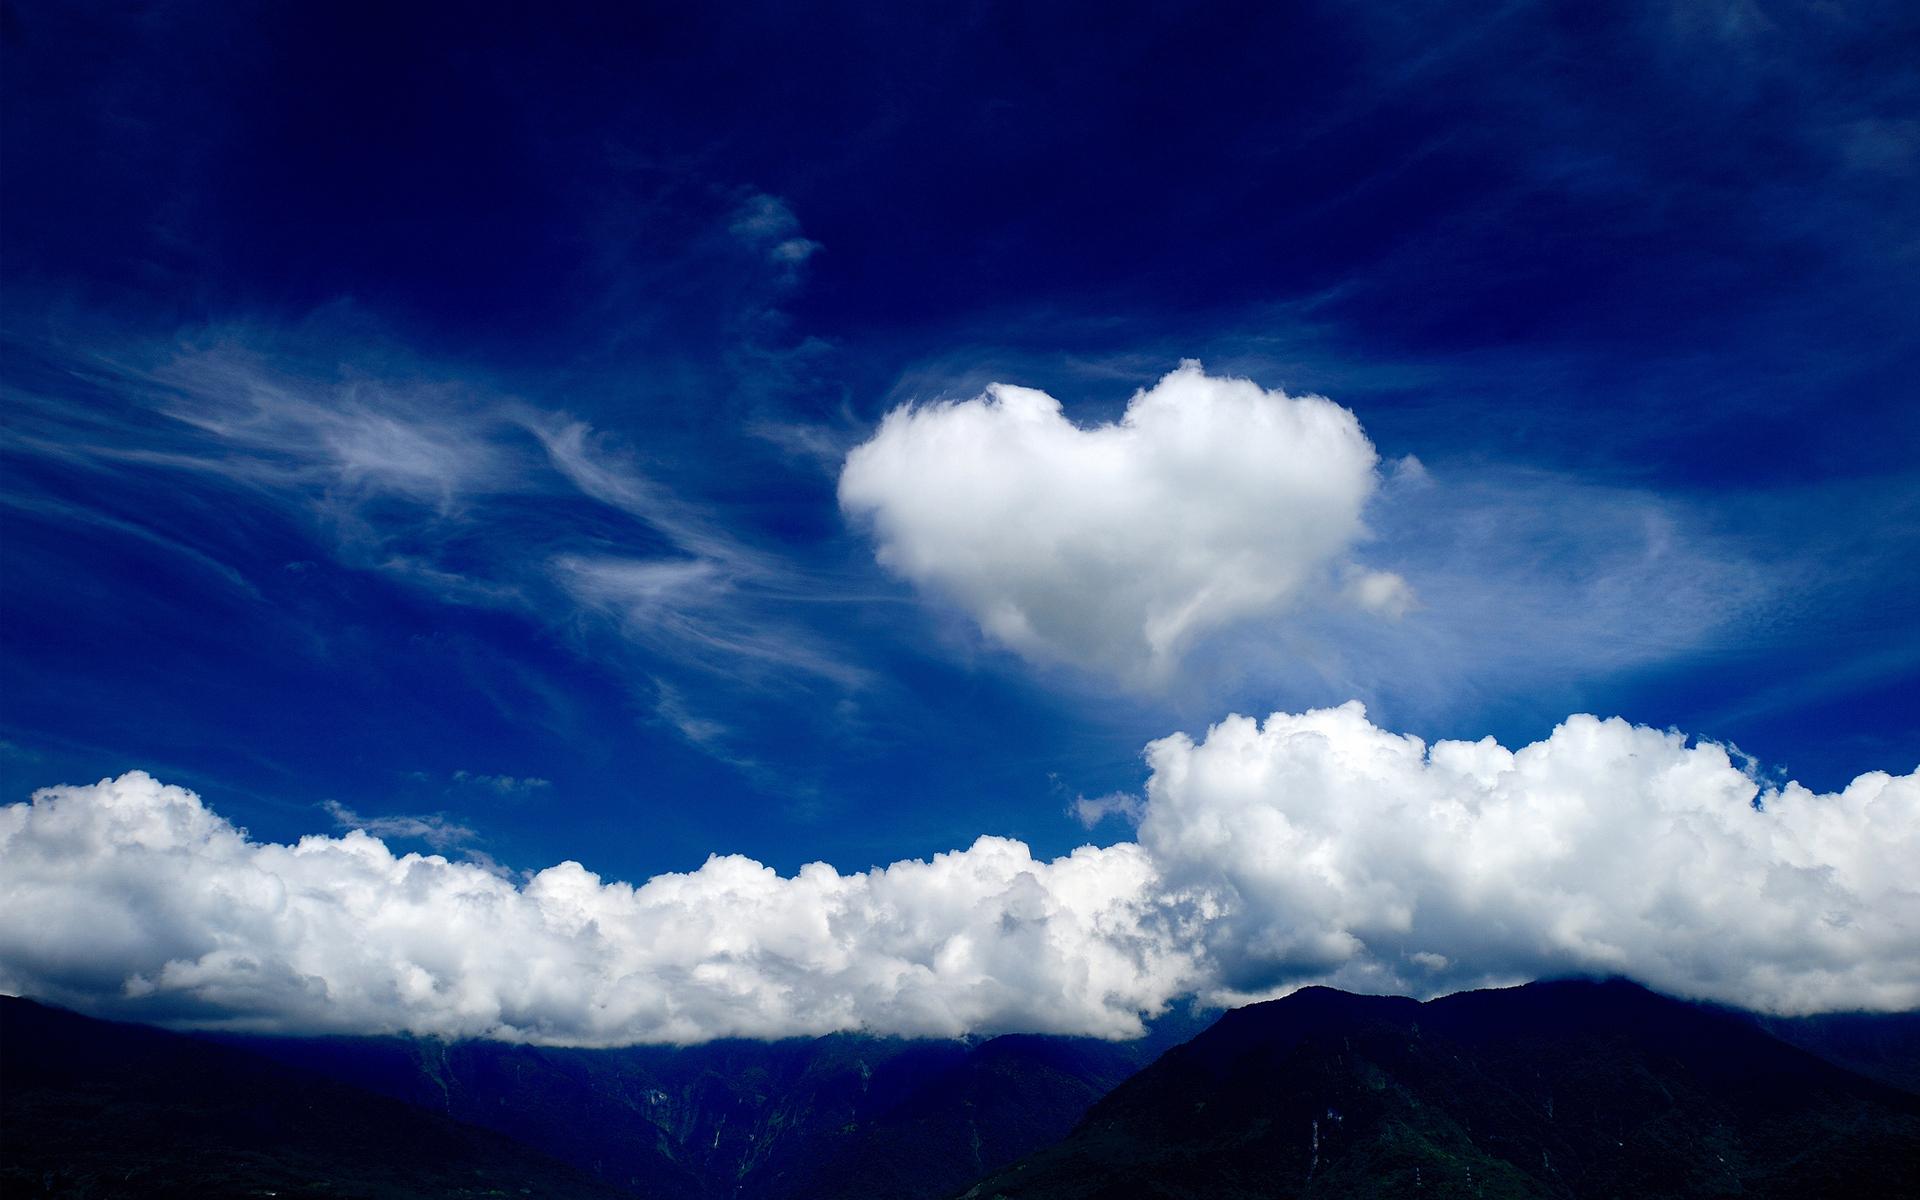 cloud wallpaper love mountains